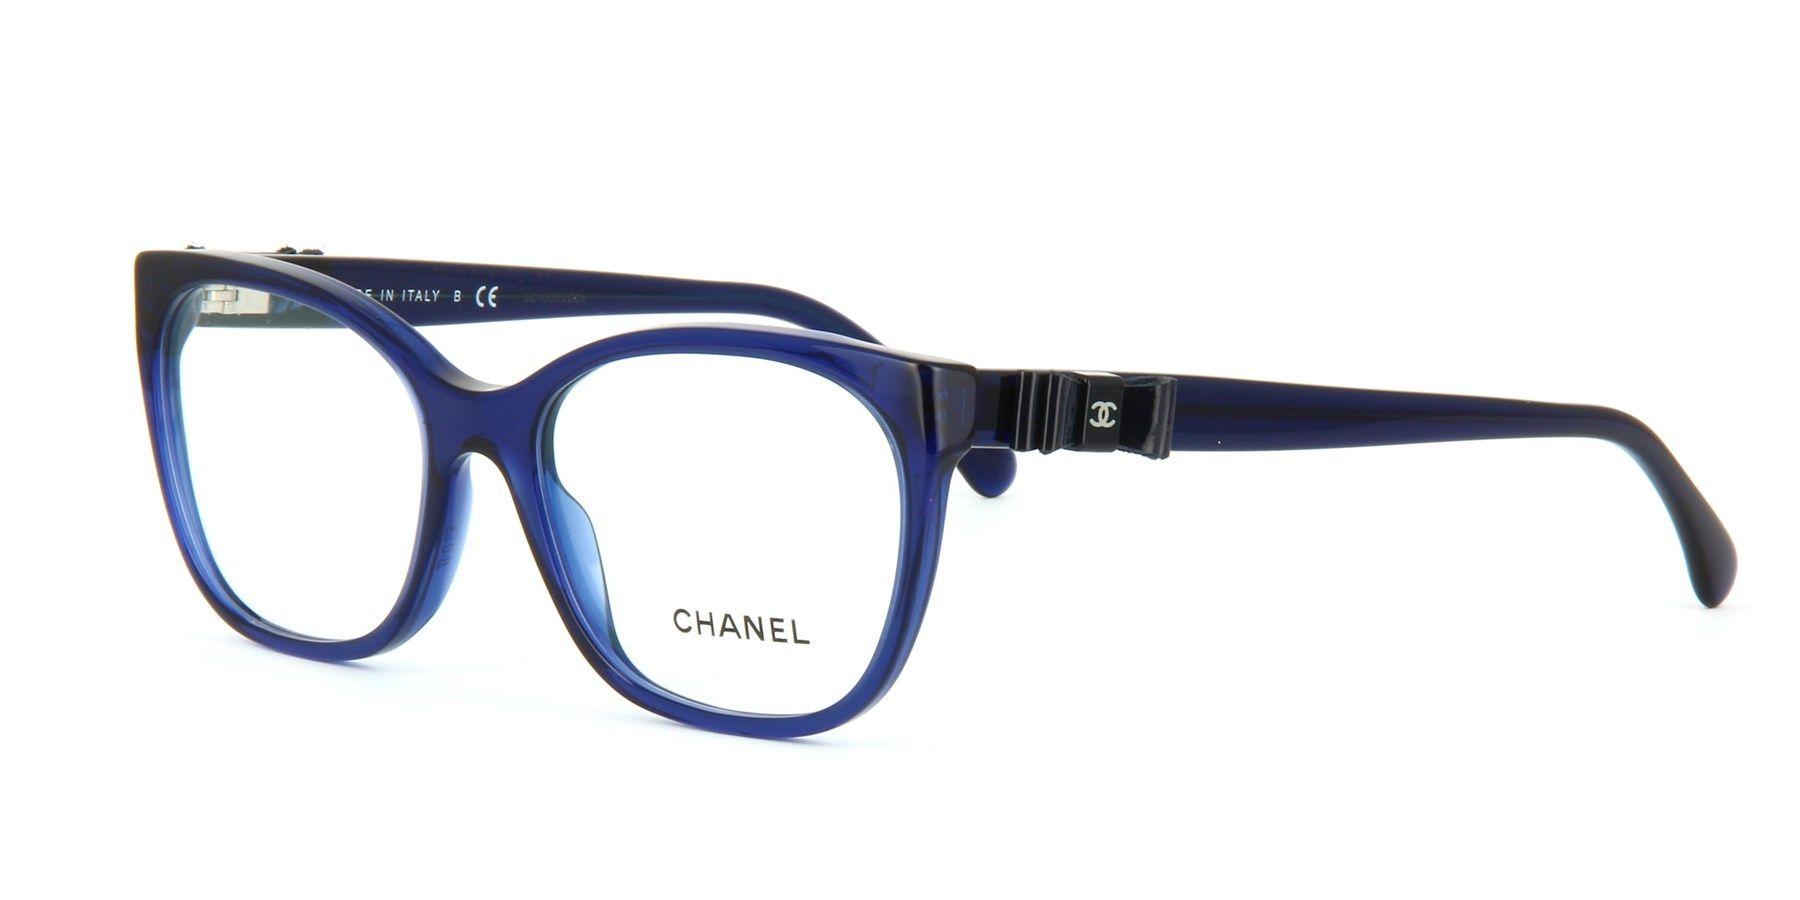 645007c4e4bd NEW IN www.pretavoir.co.uk Chanel CH3284-Q 503-hd-0021